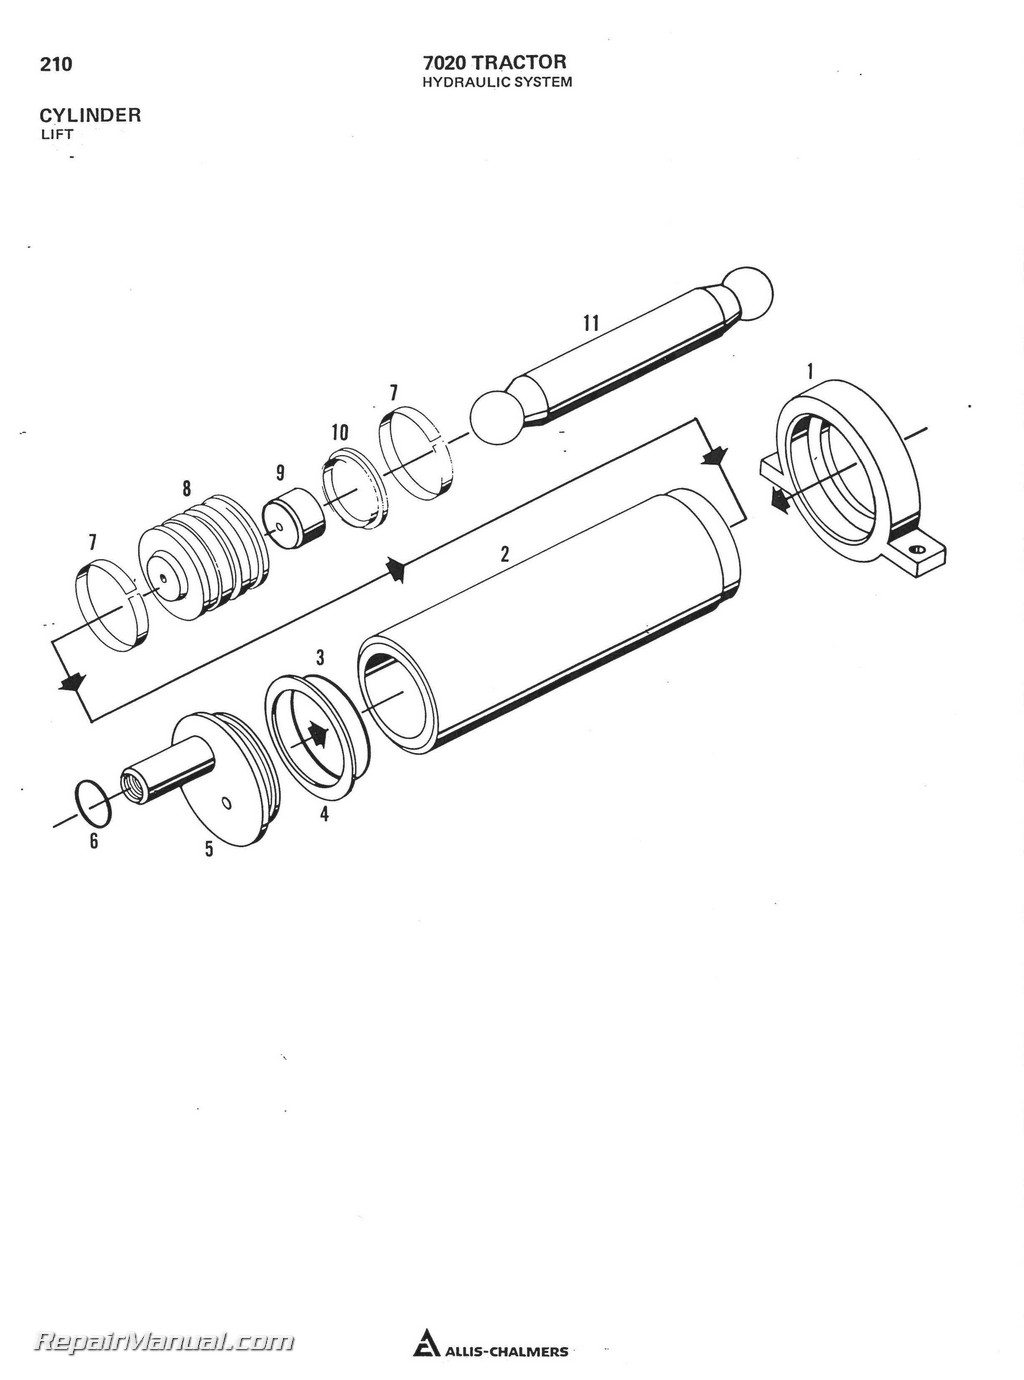 Allis Chalmerssel Tractor Parts Manual